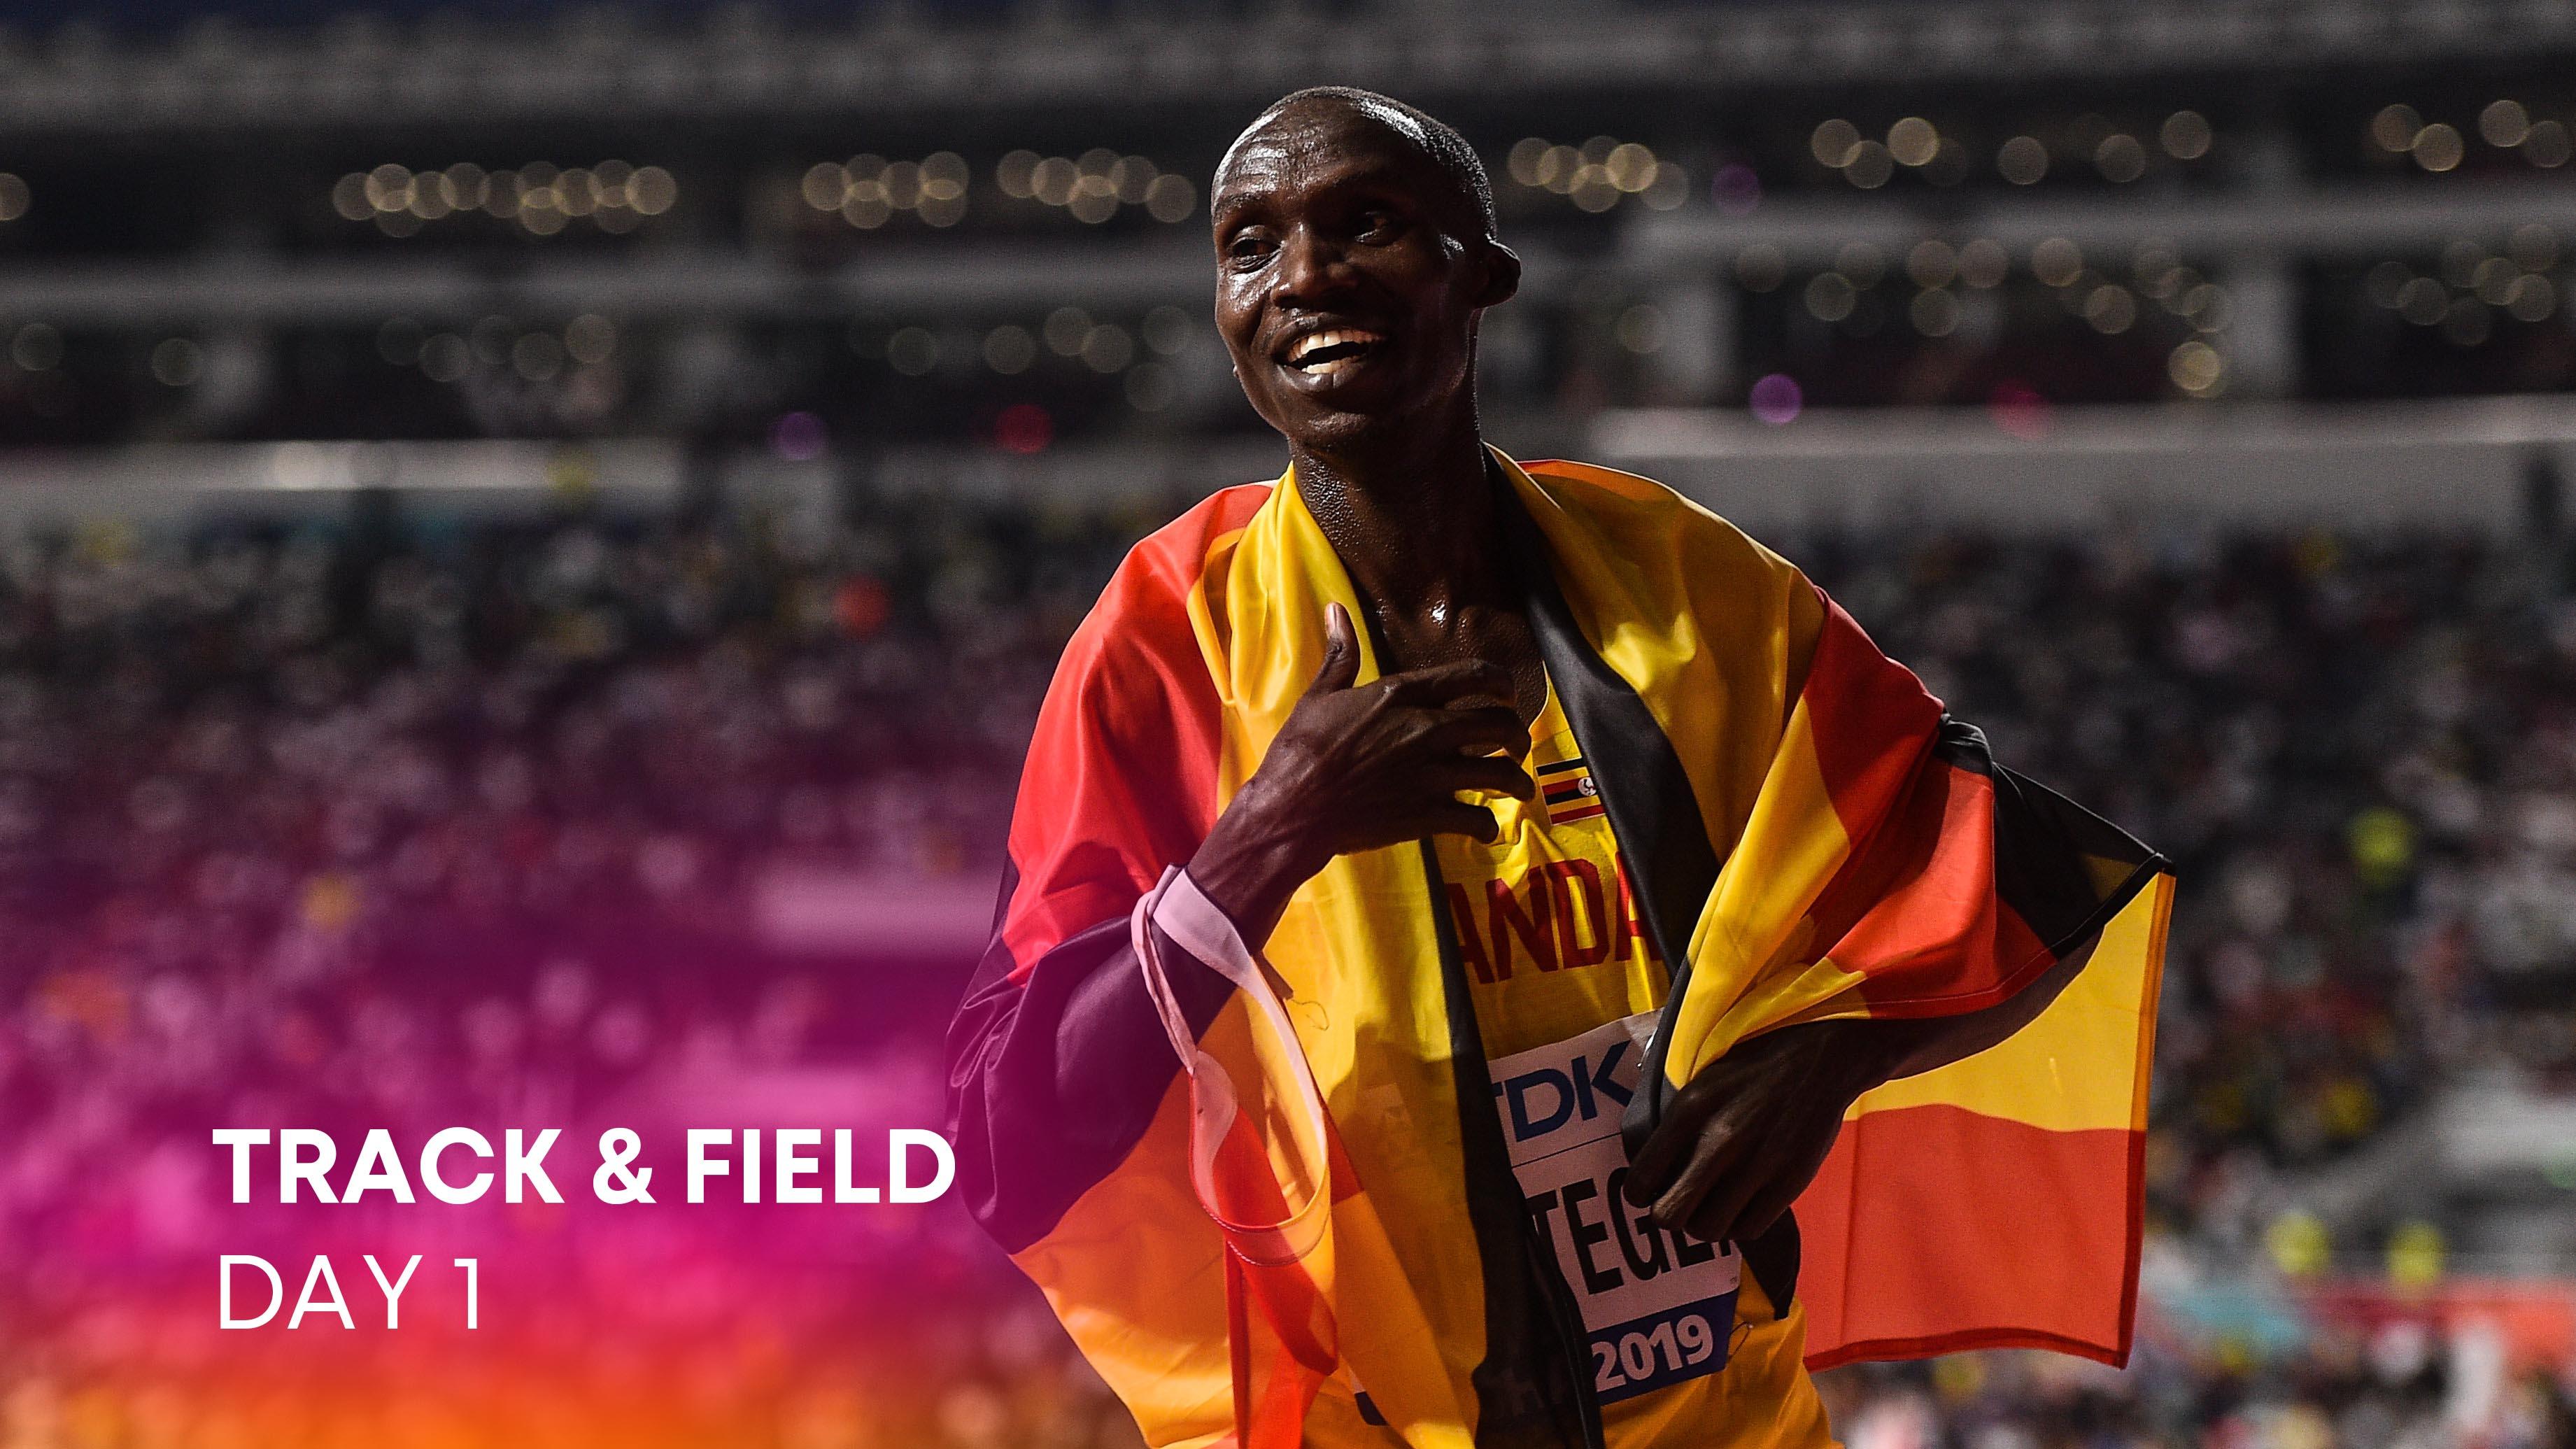 Doha , Qatar - 6 October 2019; Joshua Cheptegei of Uganda celebrates after winning the Men's...